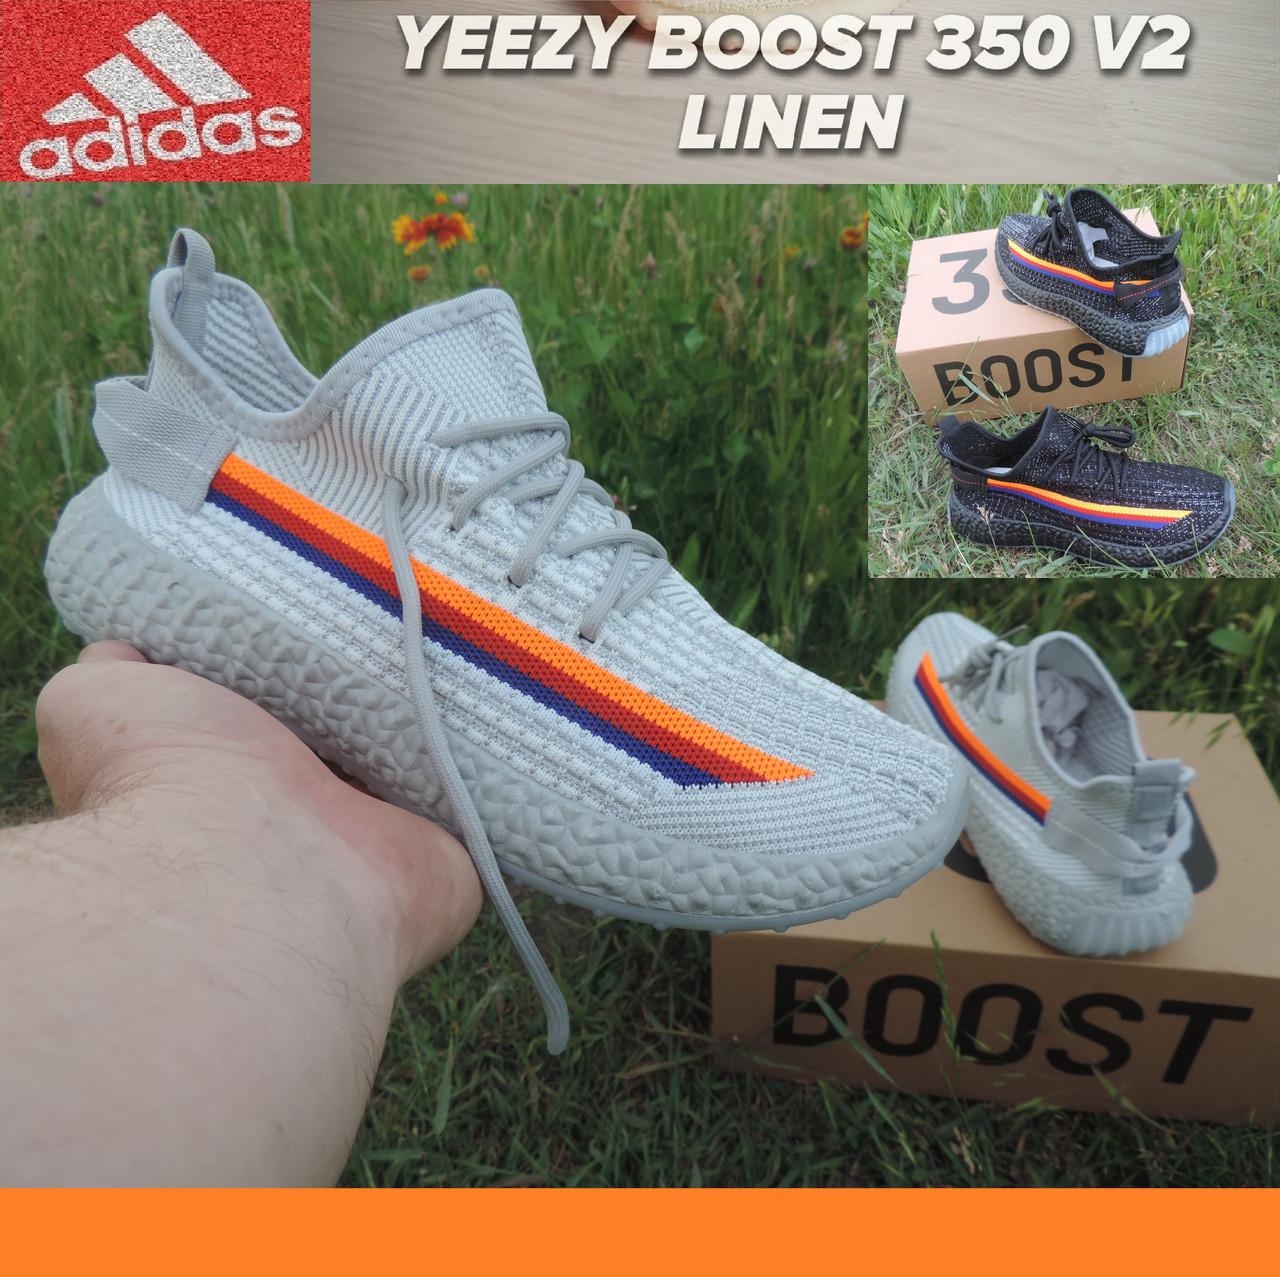 Кроссовки Adidas Yeezy Boost 350 V2.